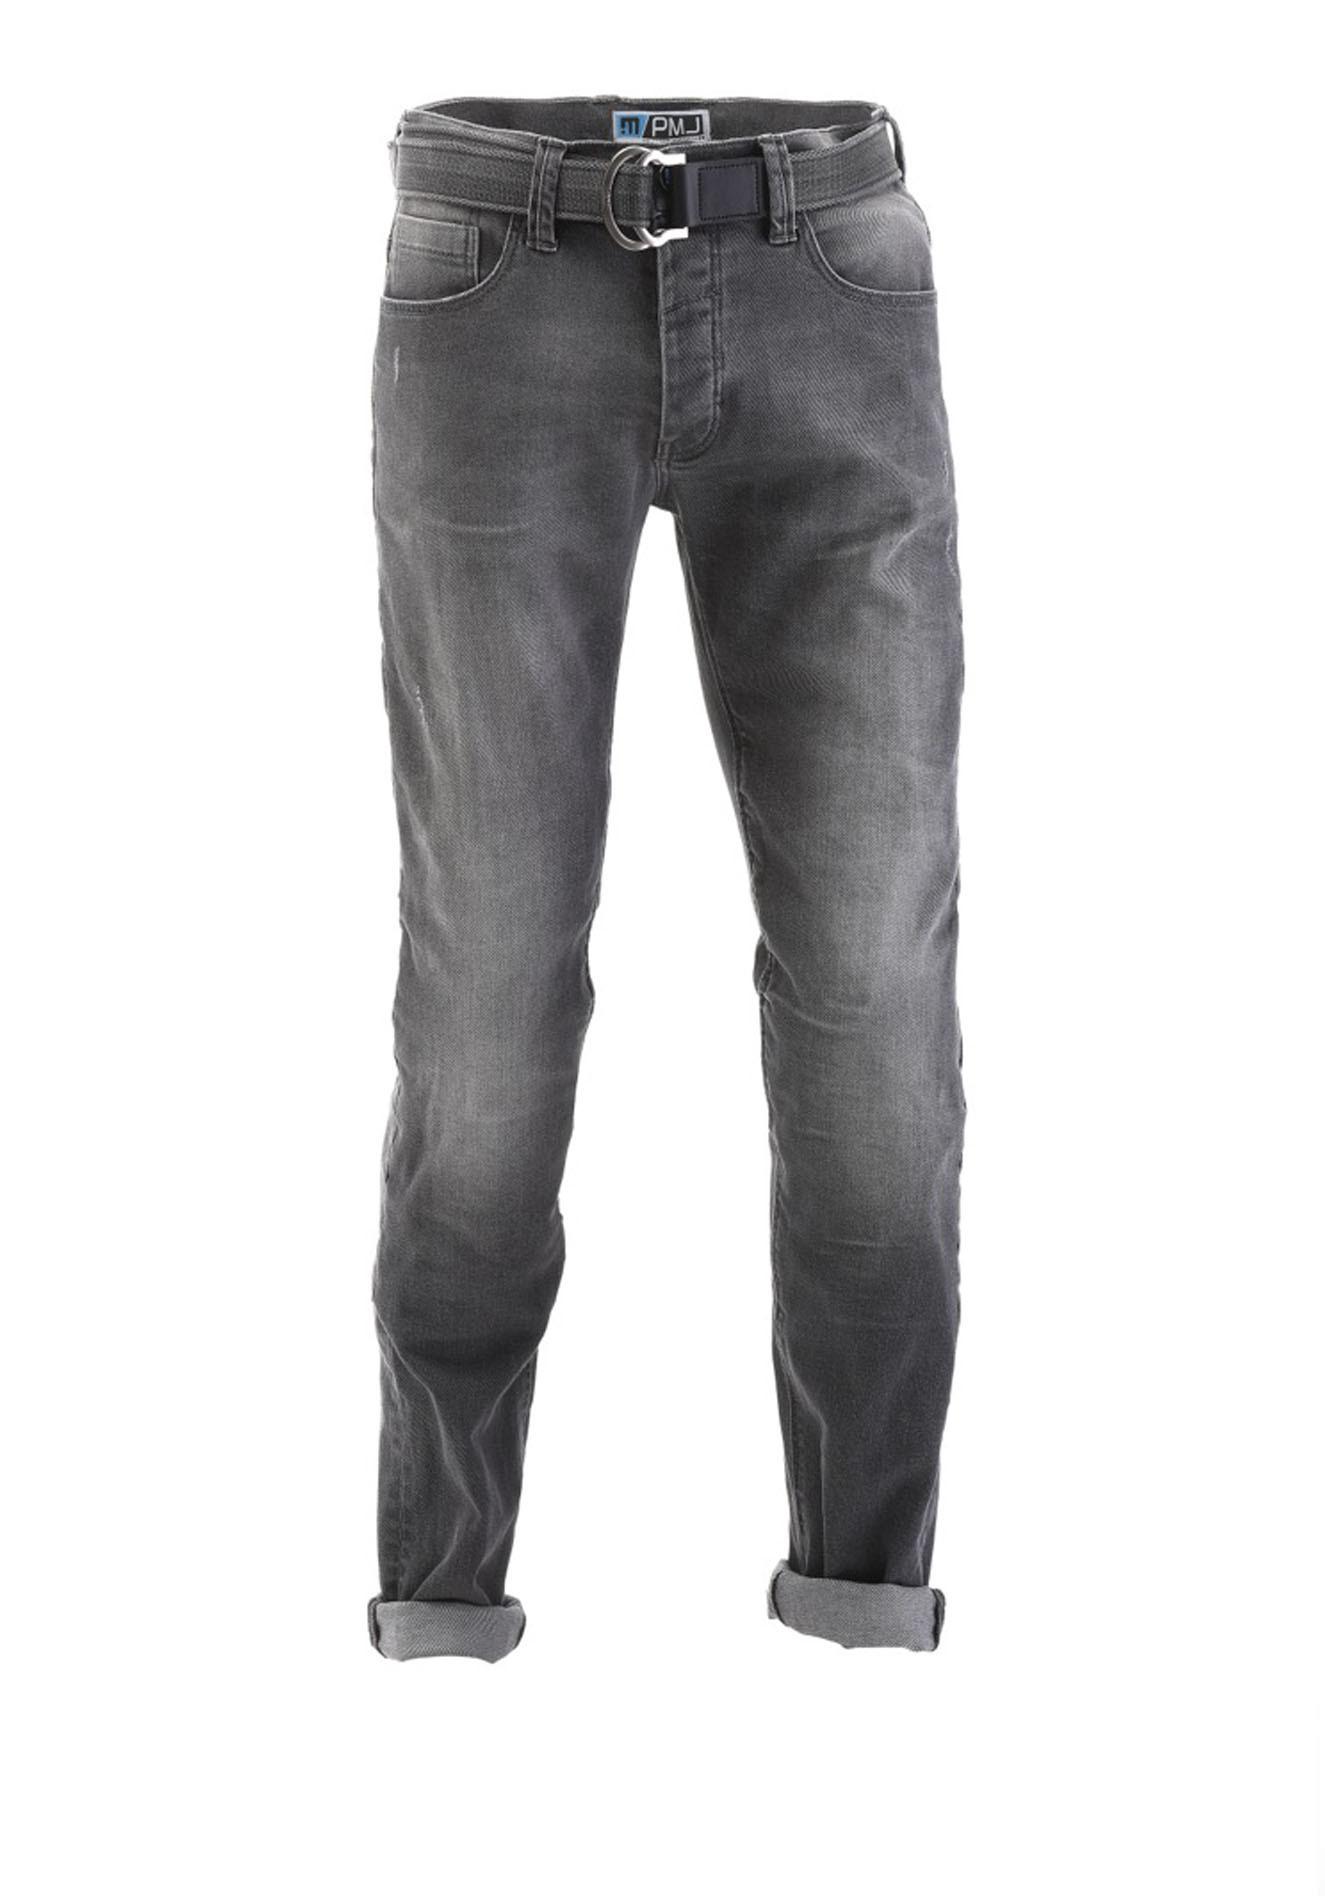 ee0933e25d Jeans moto Pmj - Promo Jeans Legend grigio